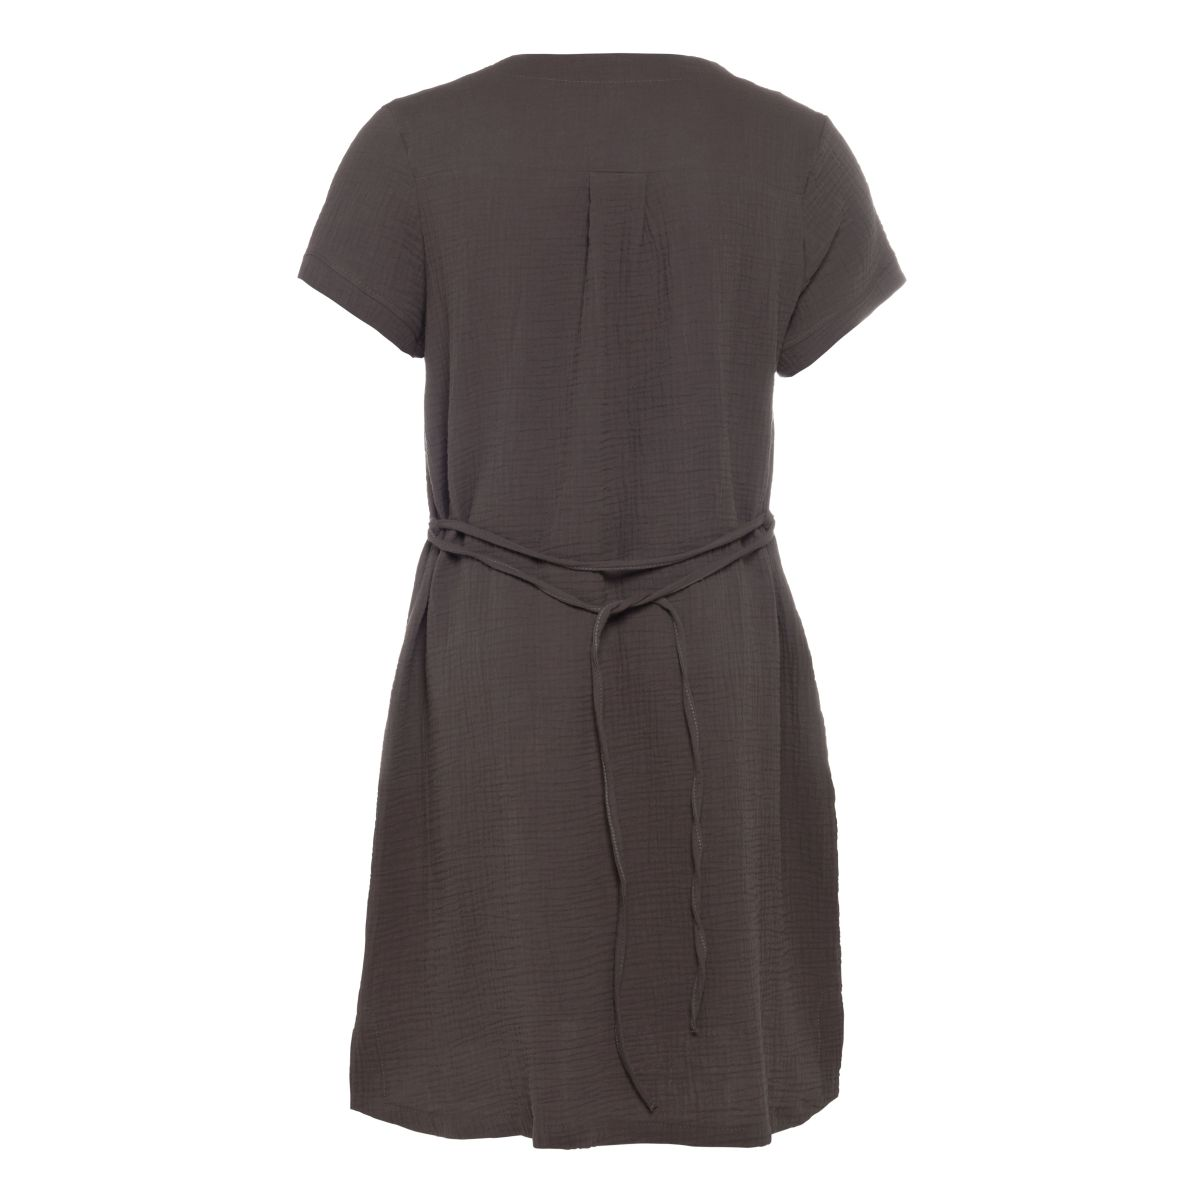 knit factory kf15012001049 indy jurk antraciet s 2